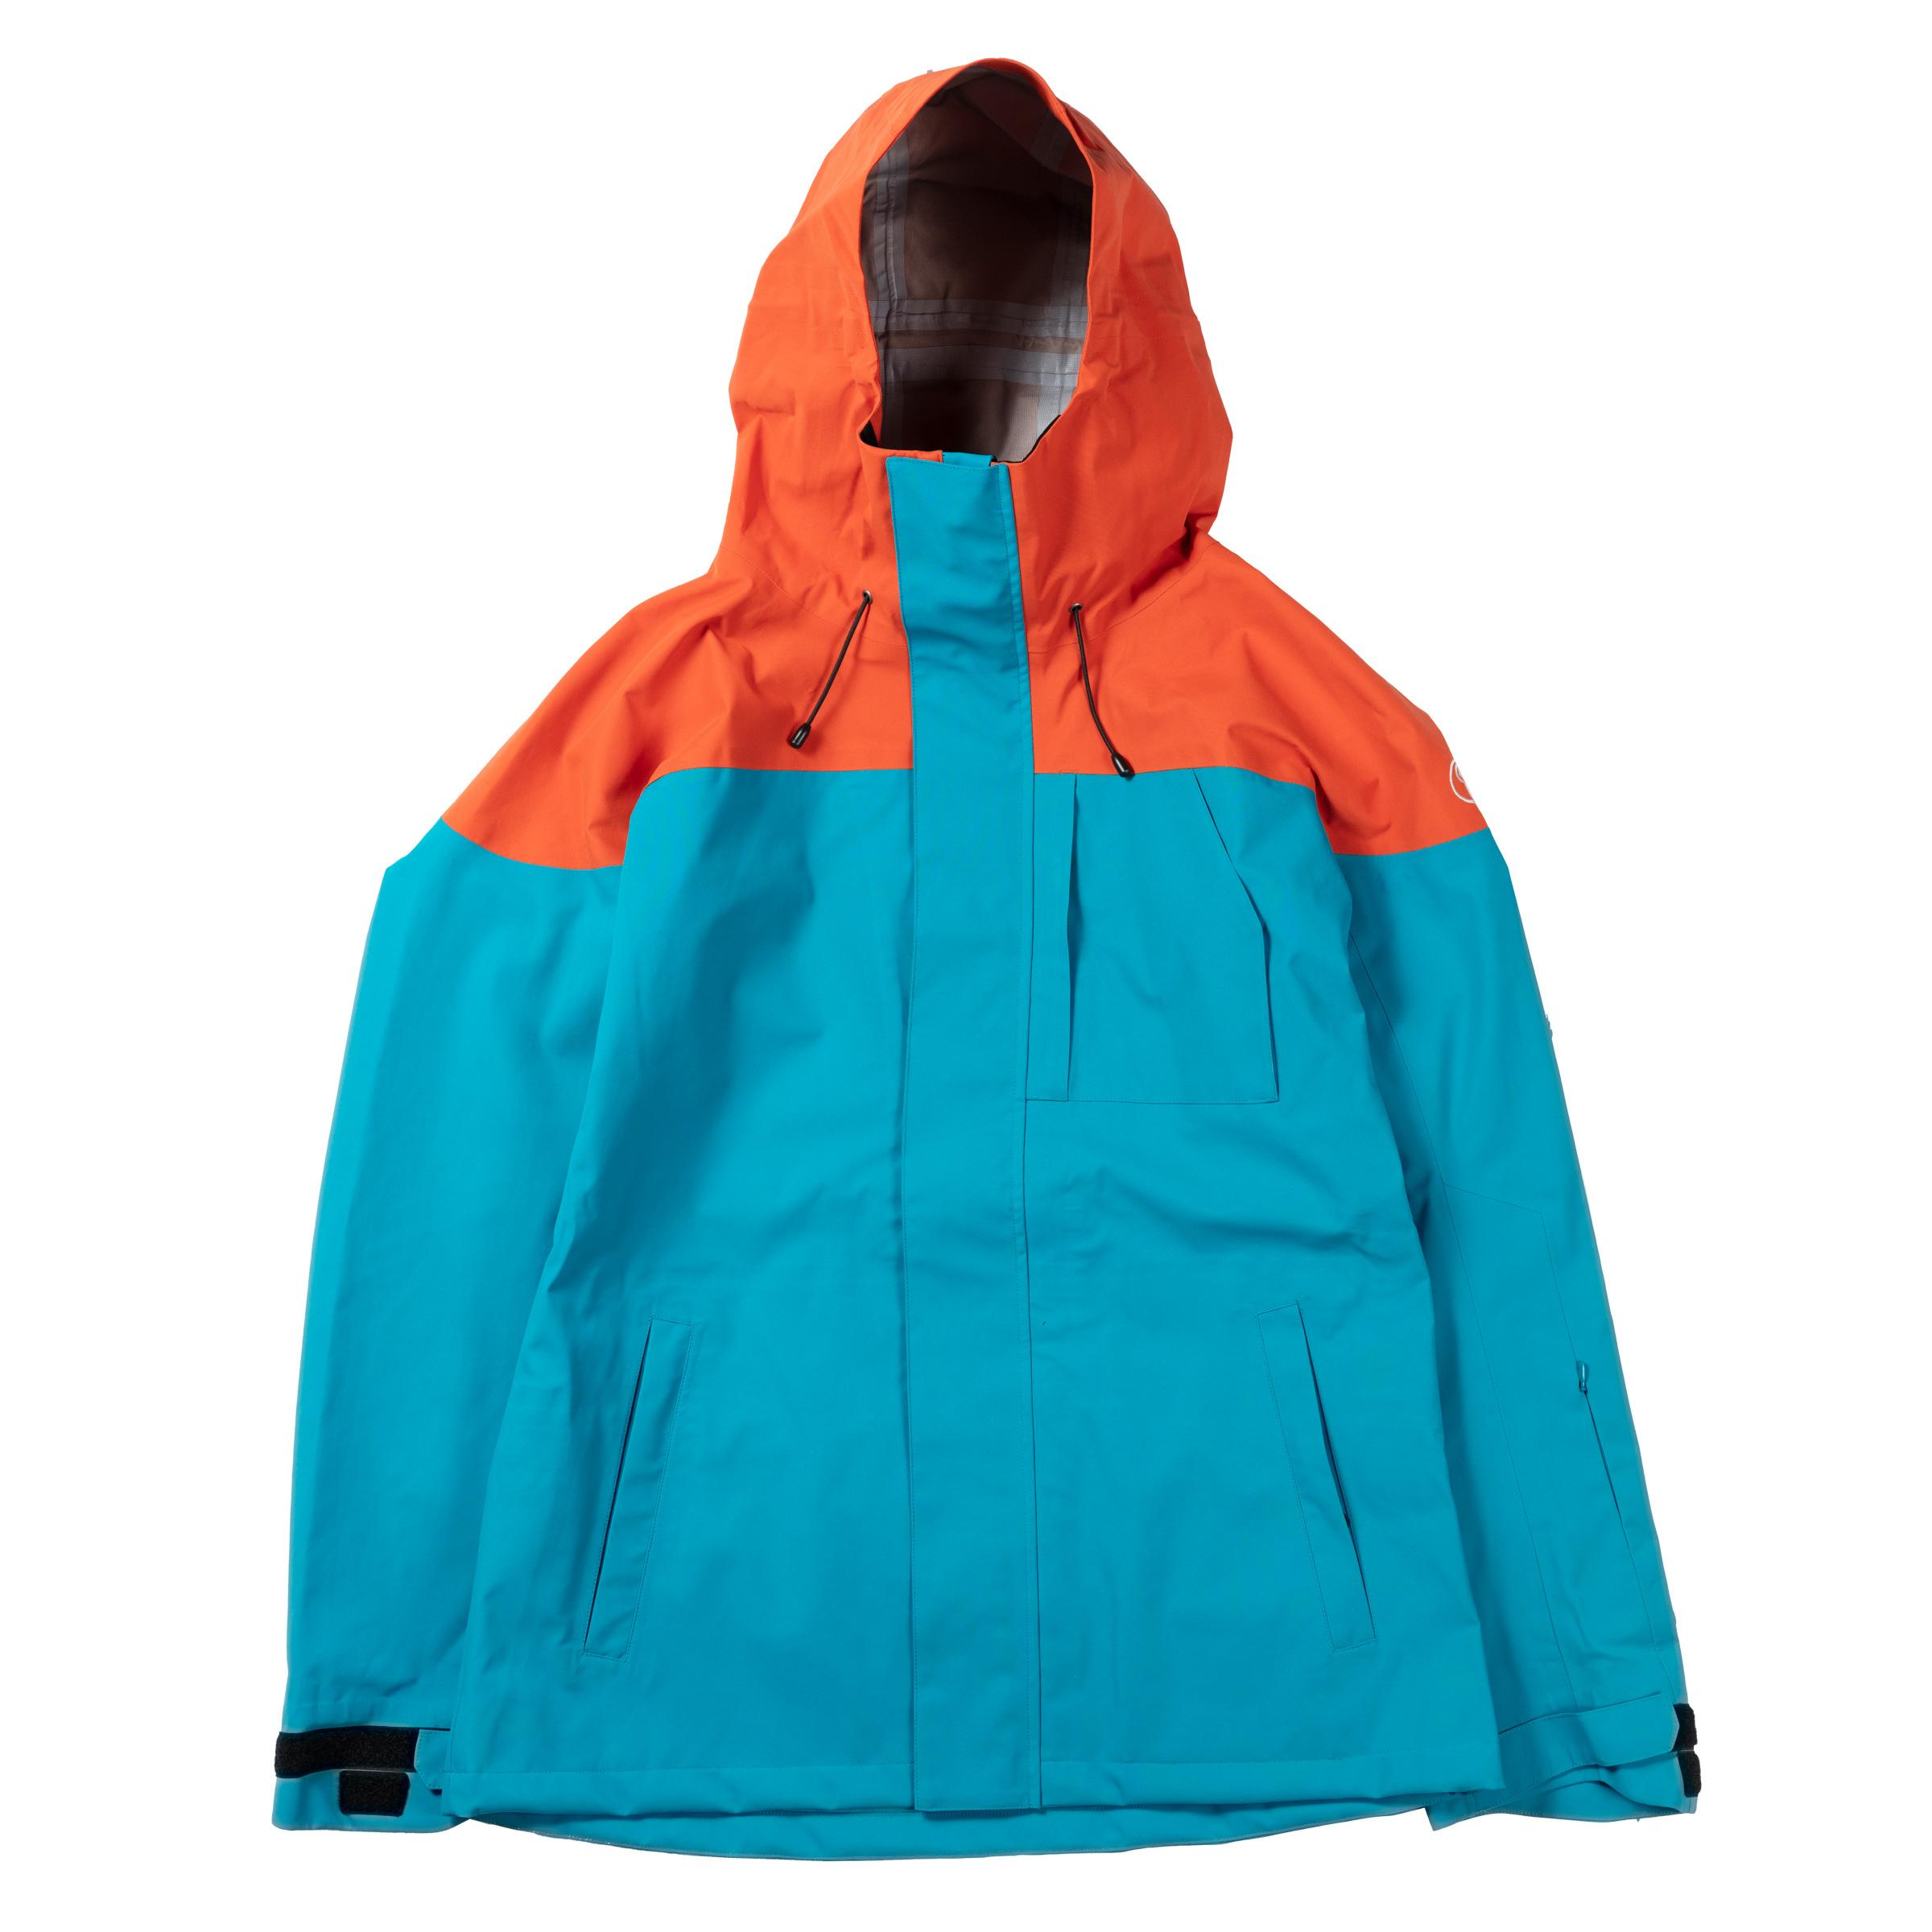 2021unfudge snow wear // PEEP JACKET // BLUE / 10月中旬発送